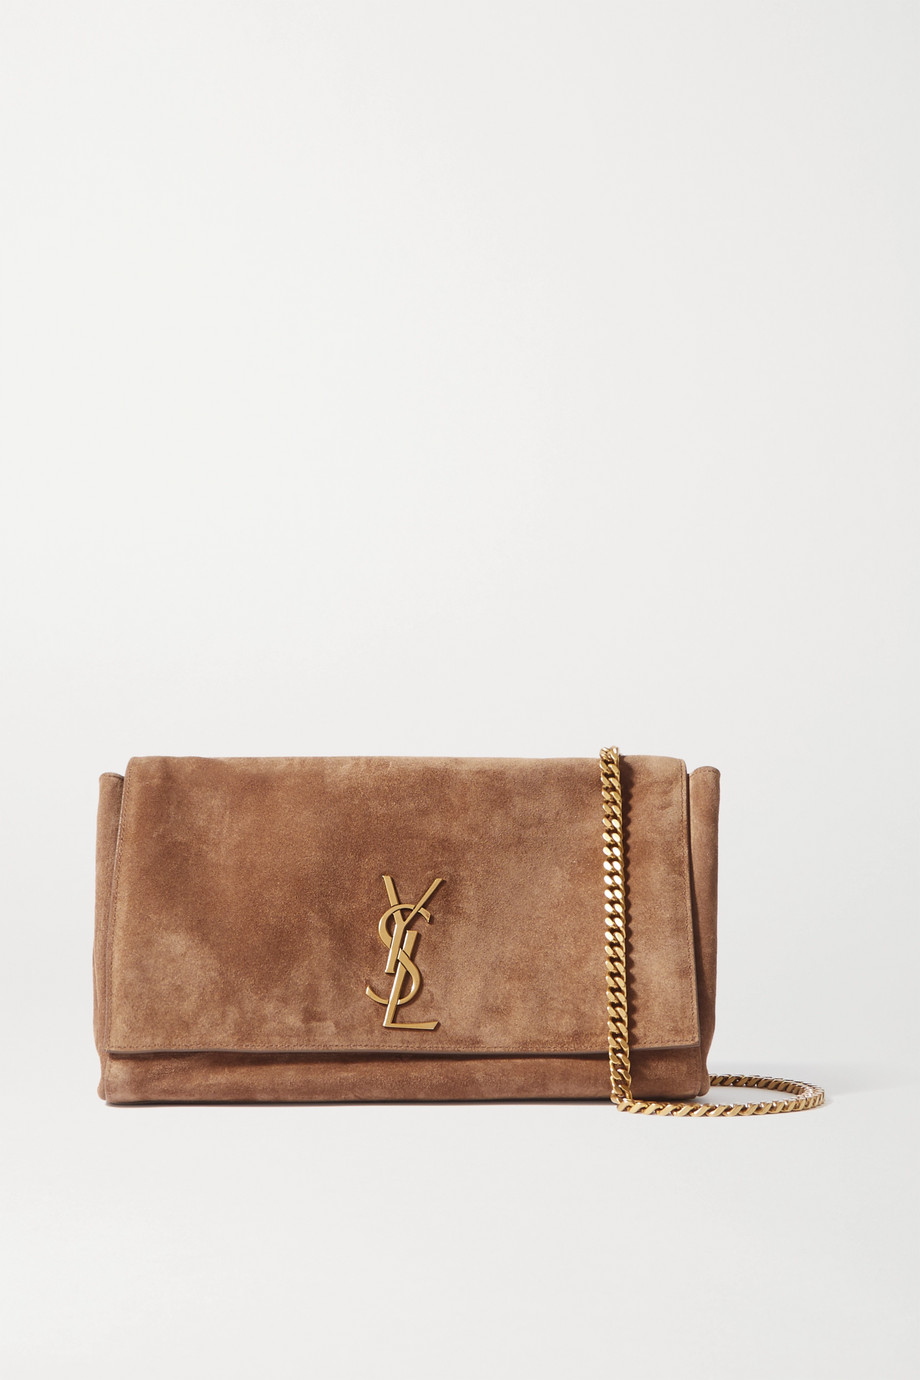 SAINT LAURENT Kate reversible leather and suede shoulder bag